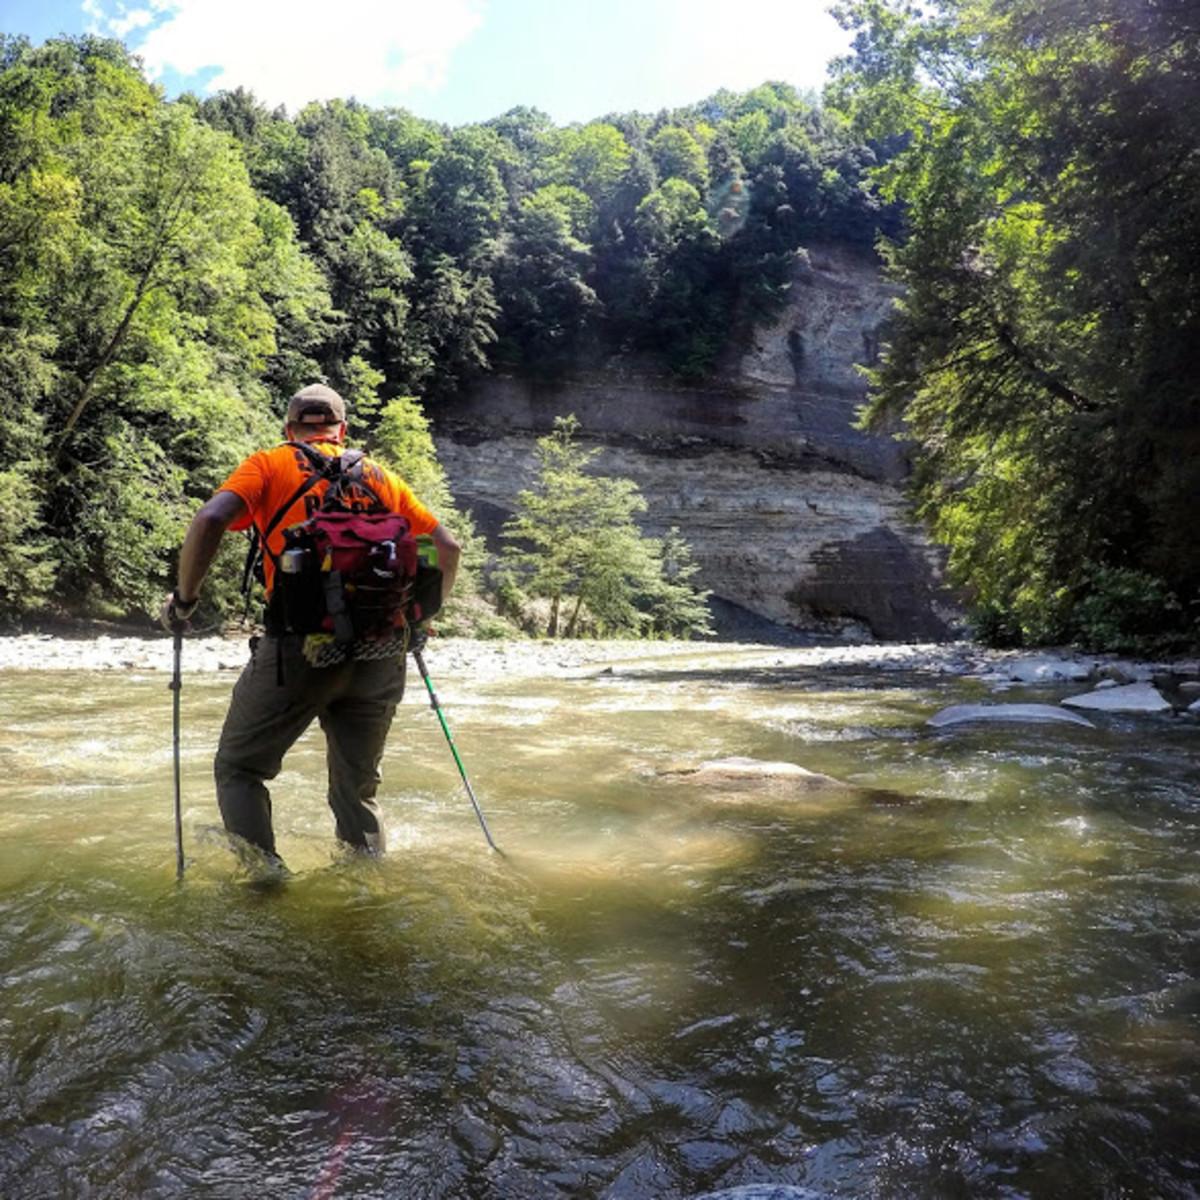 Using trekking poles to cross a river.